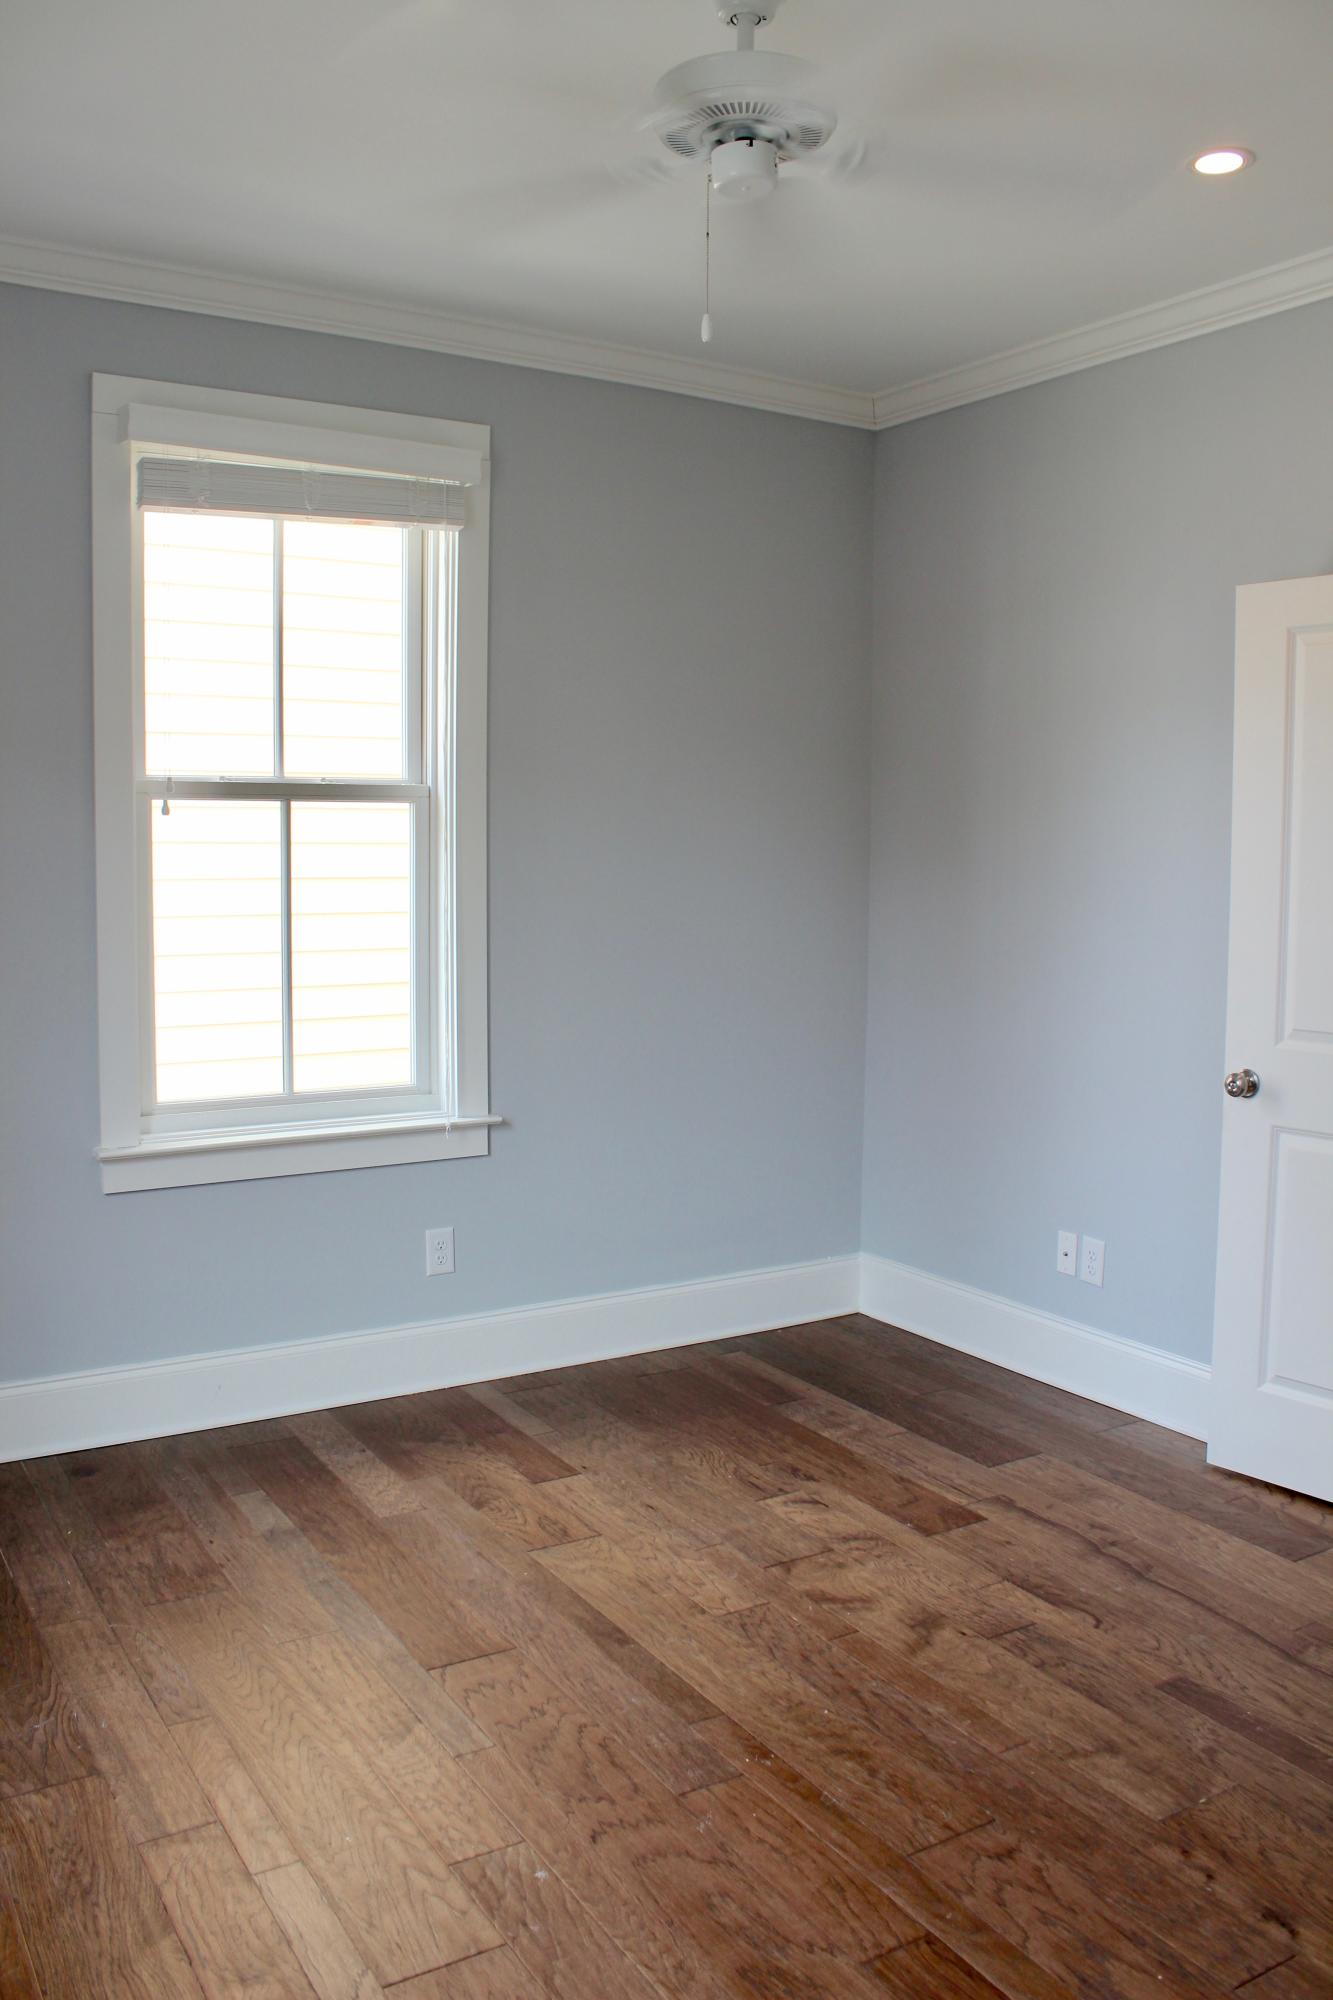 Morris Square Homes For Sale - 46 Dereef, Charleston, SC - 0